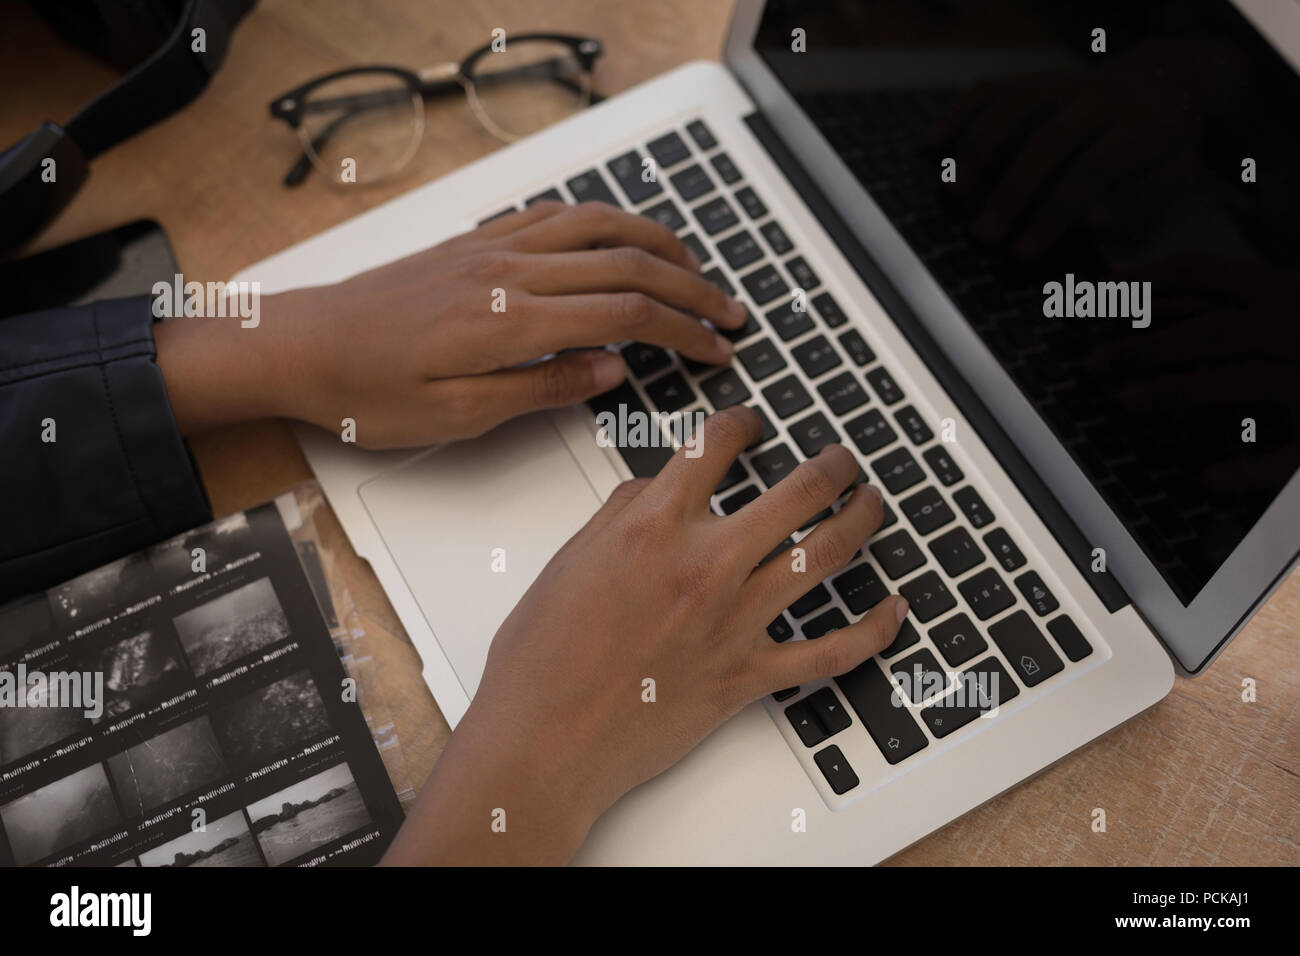 Photographer using laptop on desk Stock Photo